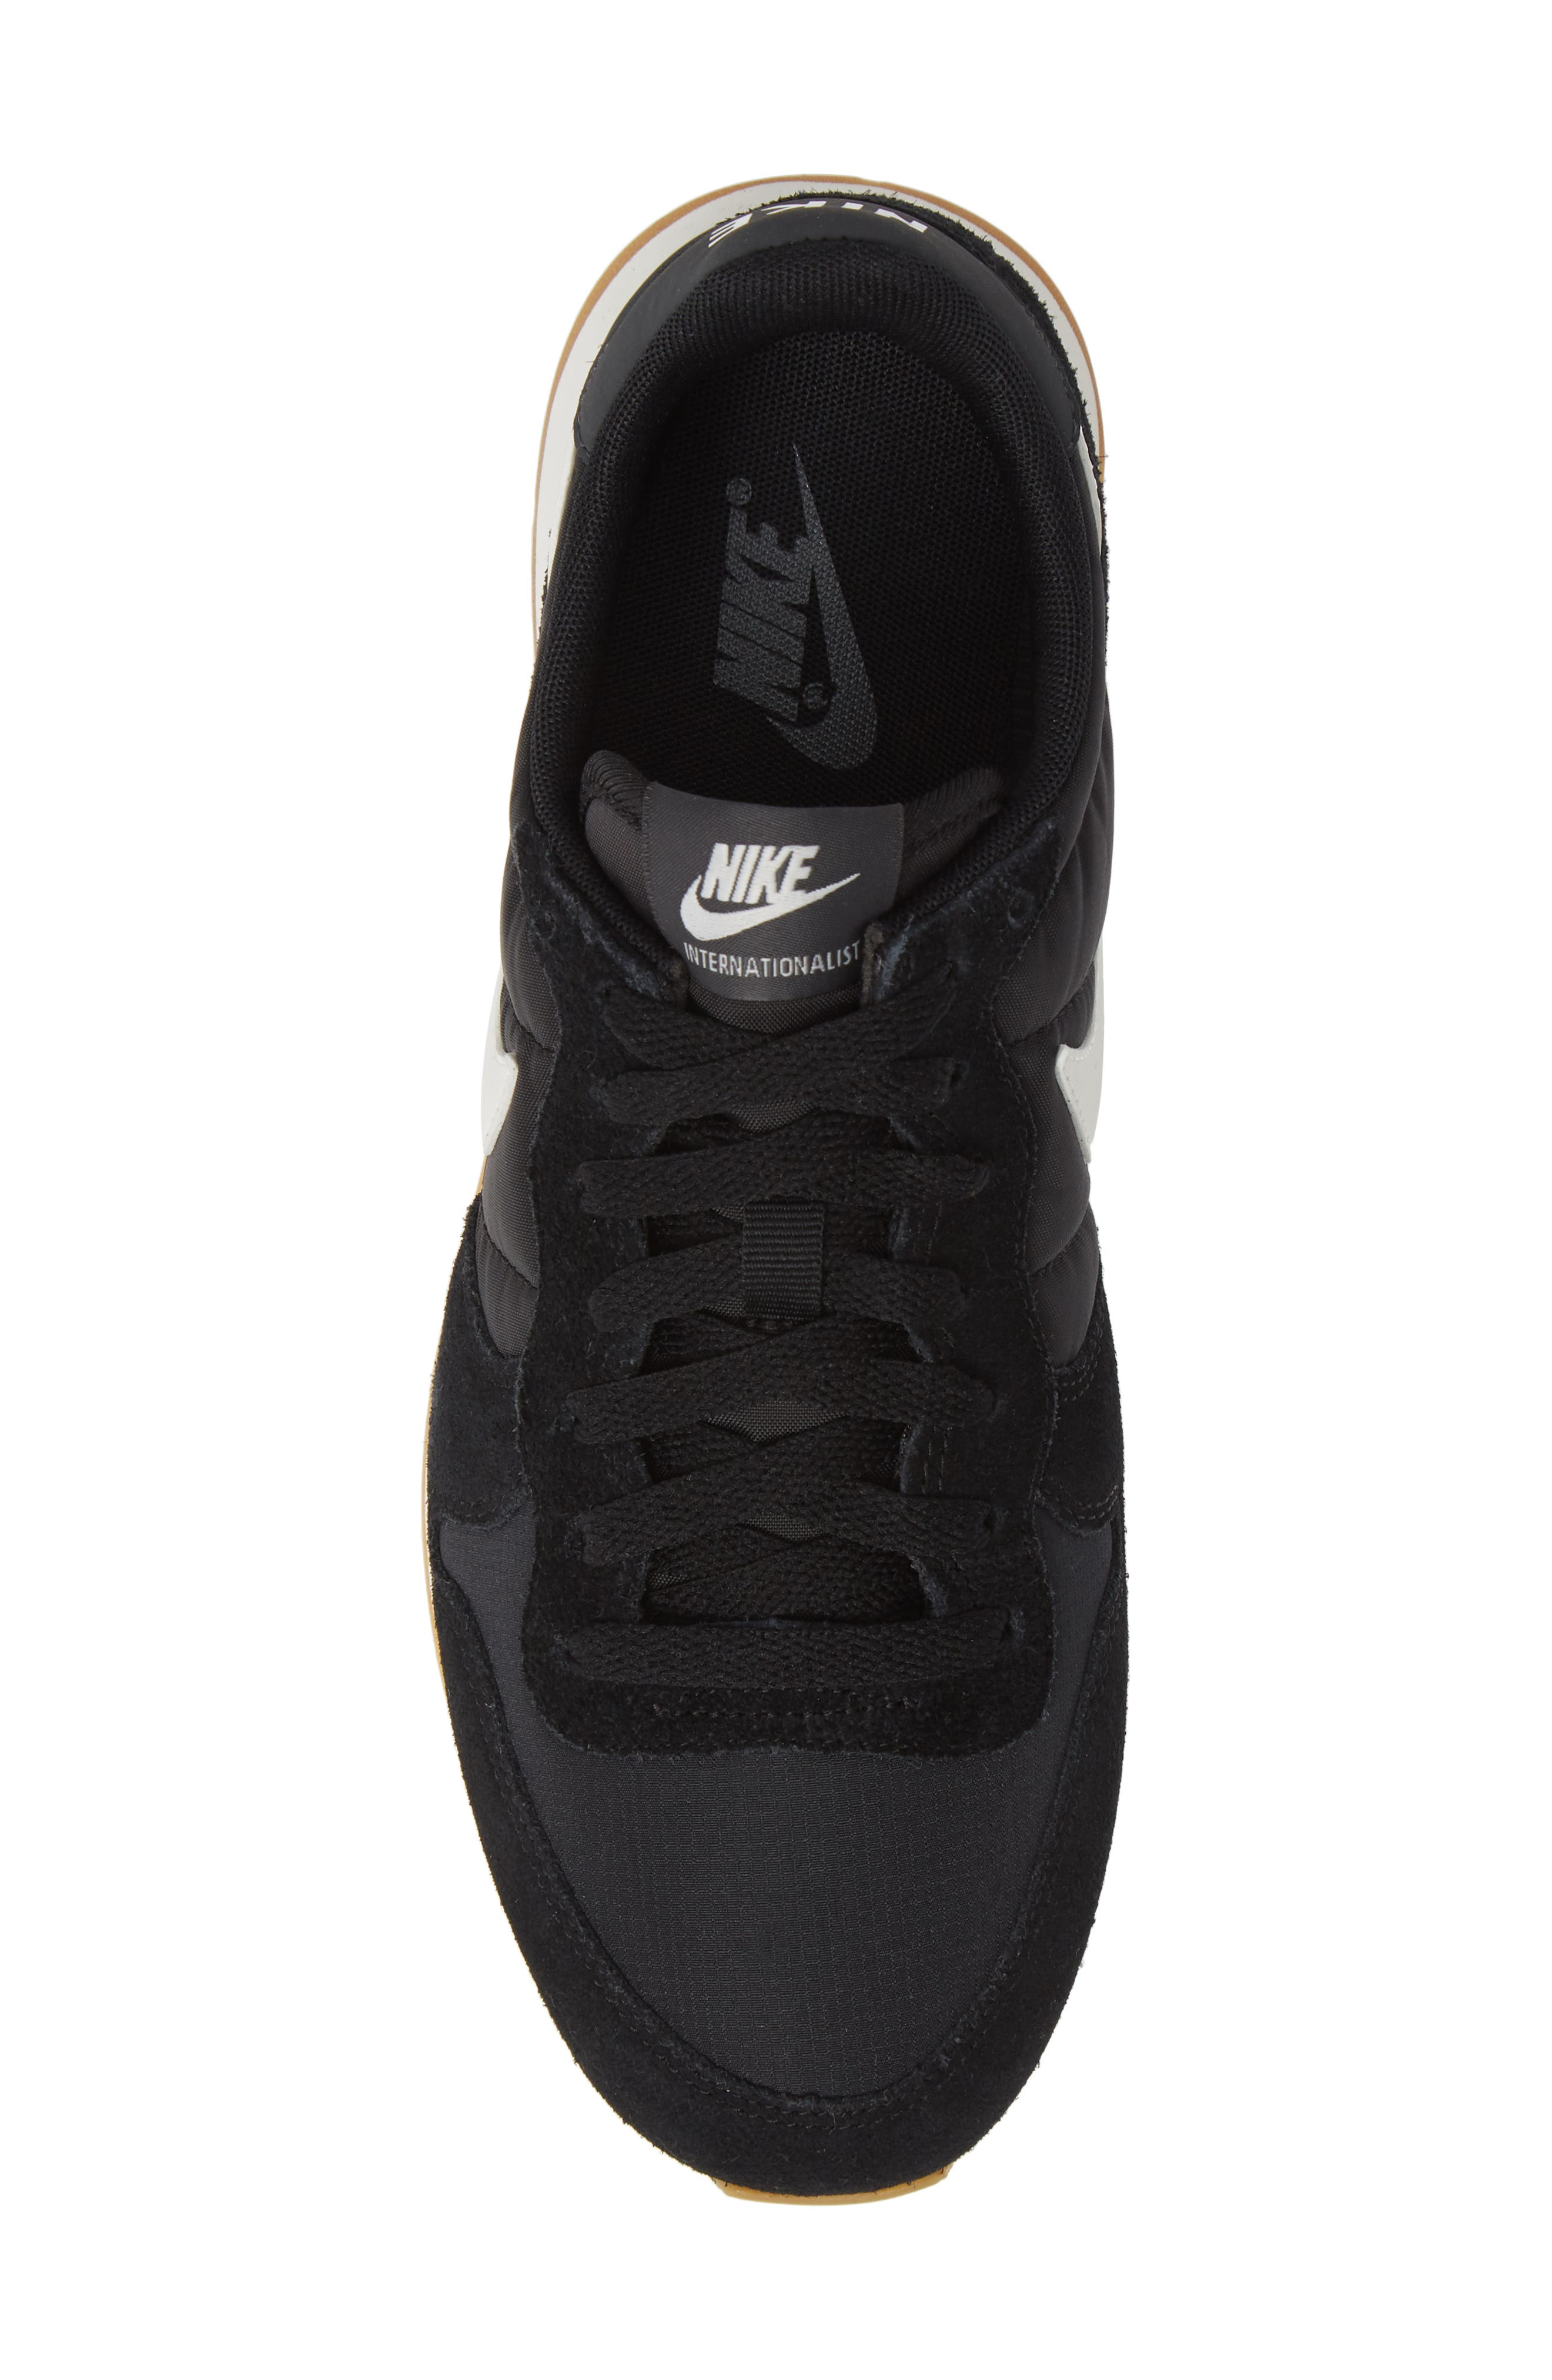 NIKE, 'Internationalist' Sneaker, Alternate thumbnail 5, color, 001